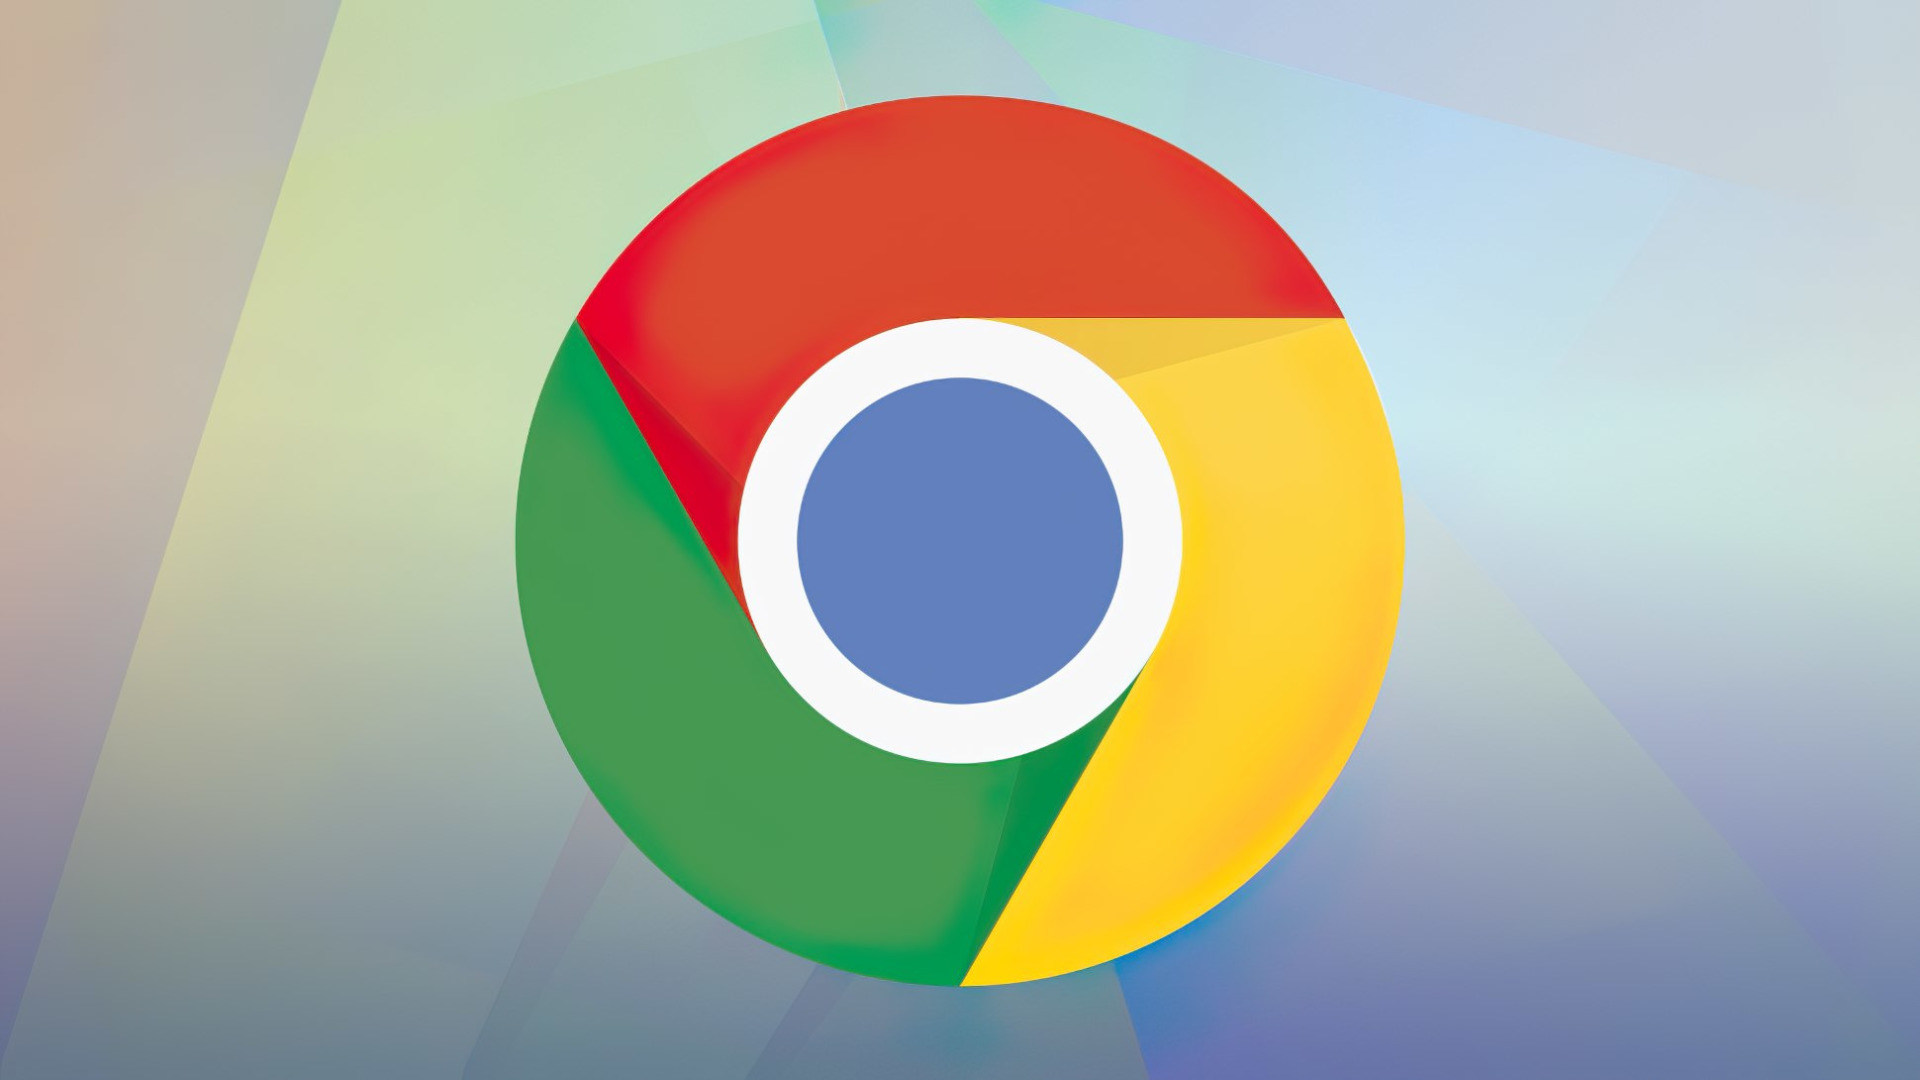 Browser, Logo, Chrome, Webbrowser, Google Chrome, Chrome Browser, Chrome Logo, Google Chrome Browser, Chrome für Android